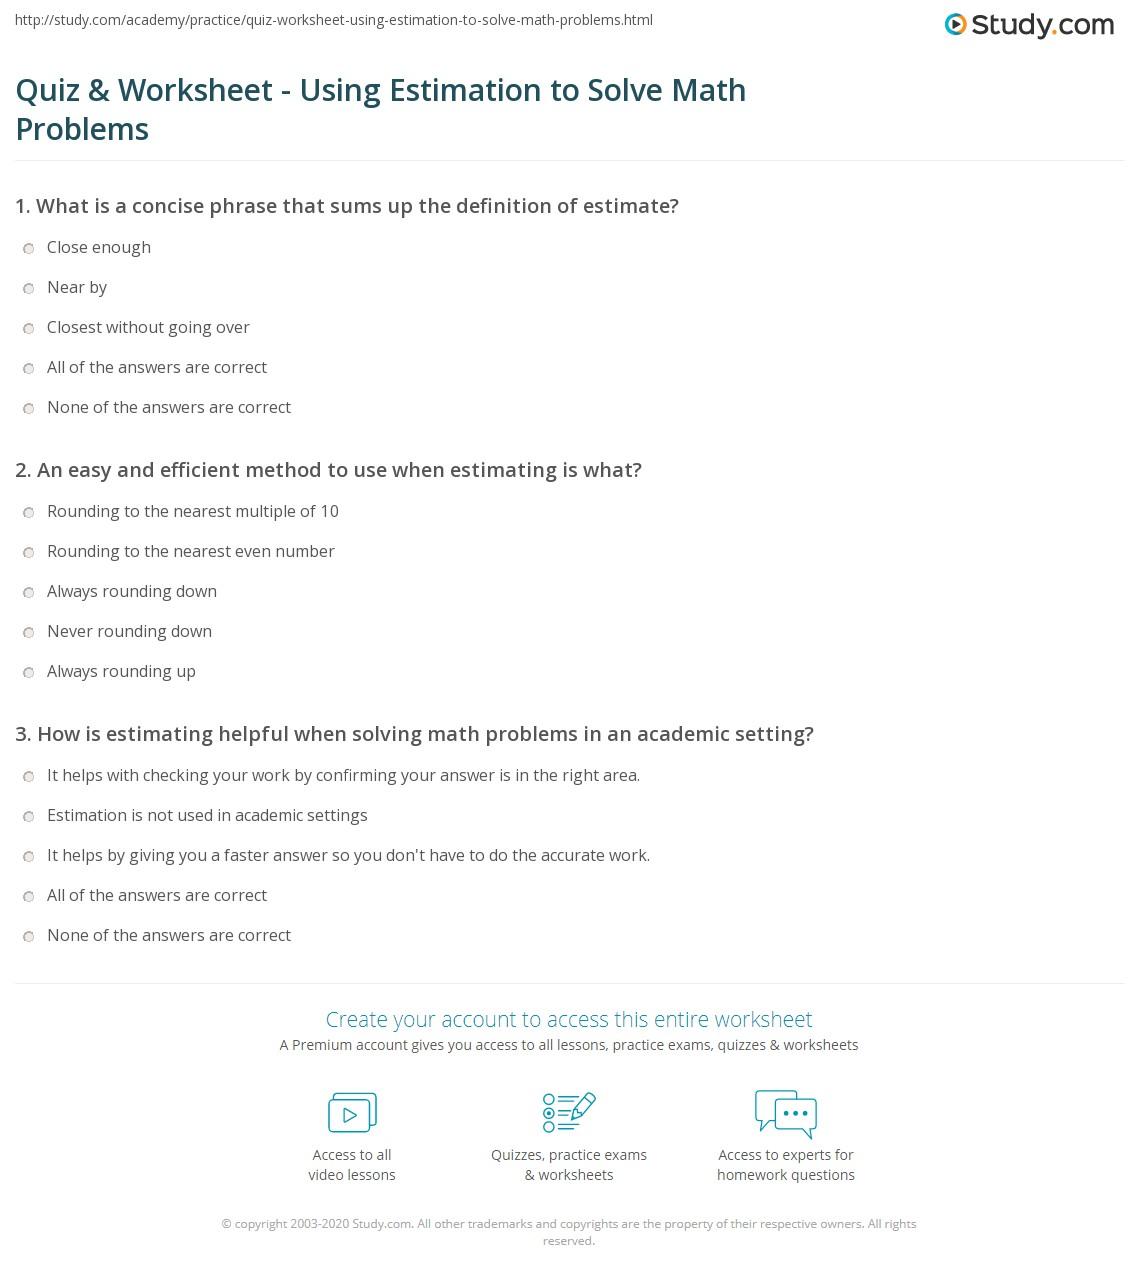 Quiz & Worksheet - Using Estimation to Solve Math Problems | Study.com